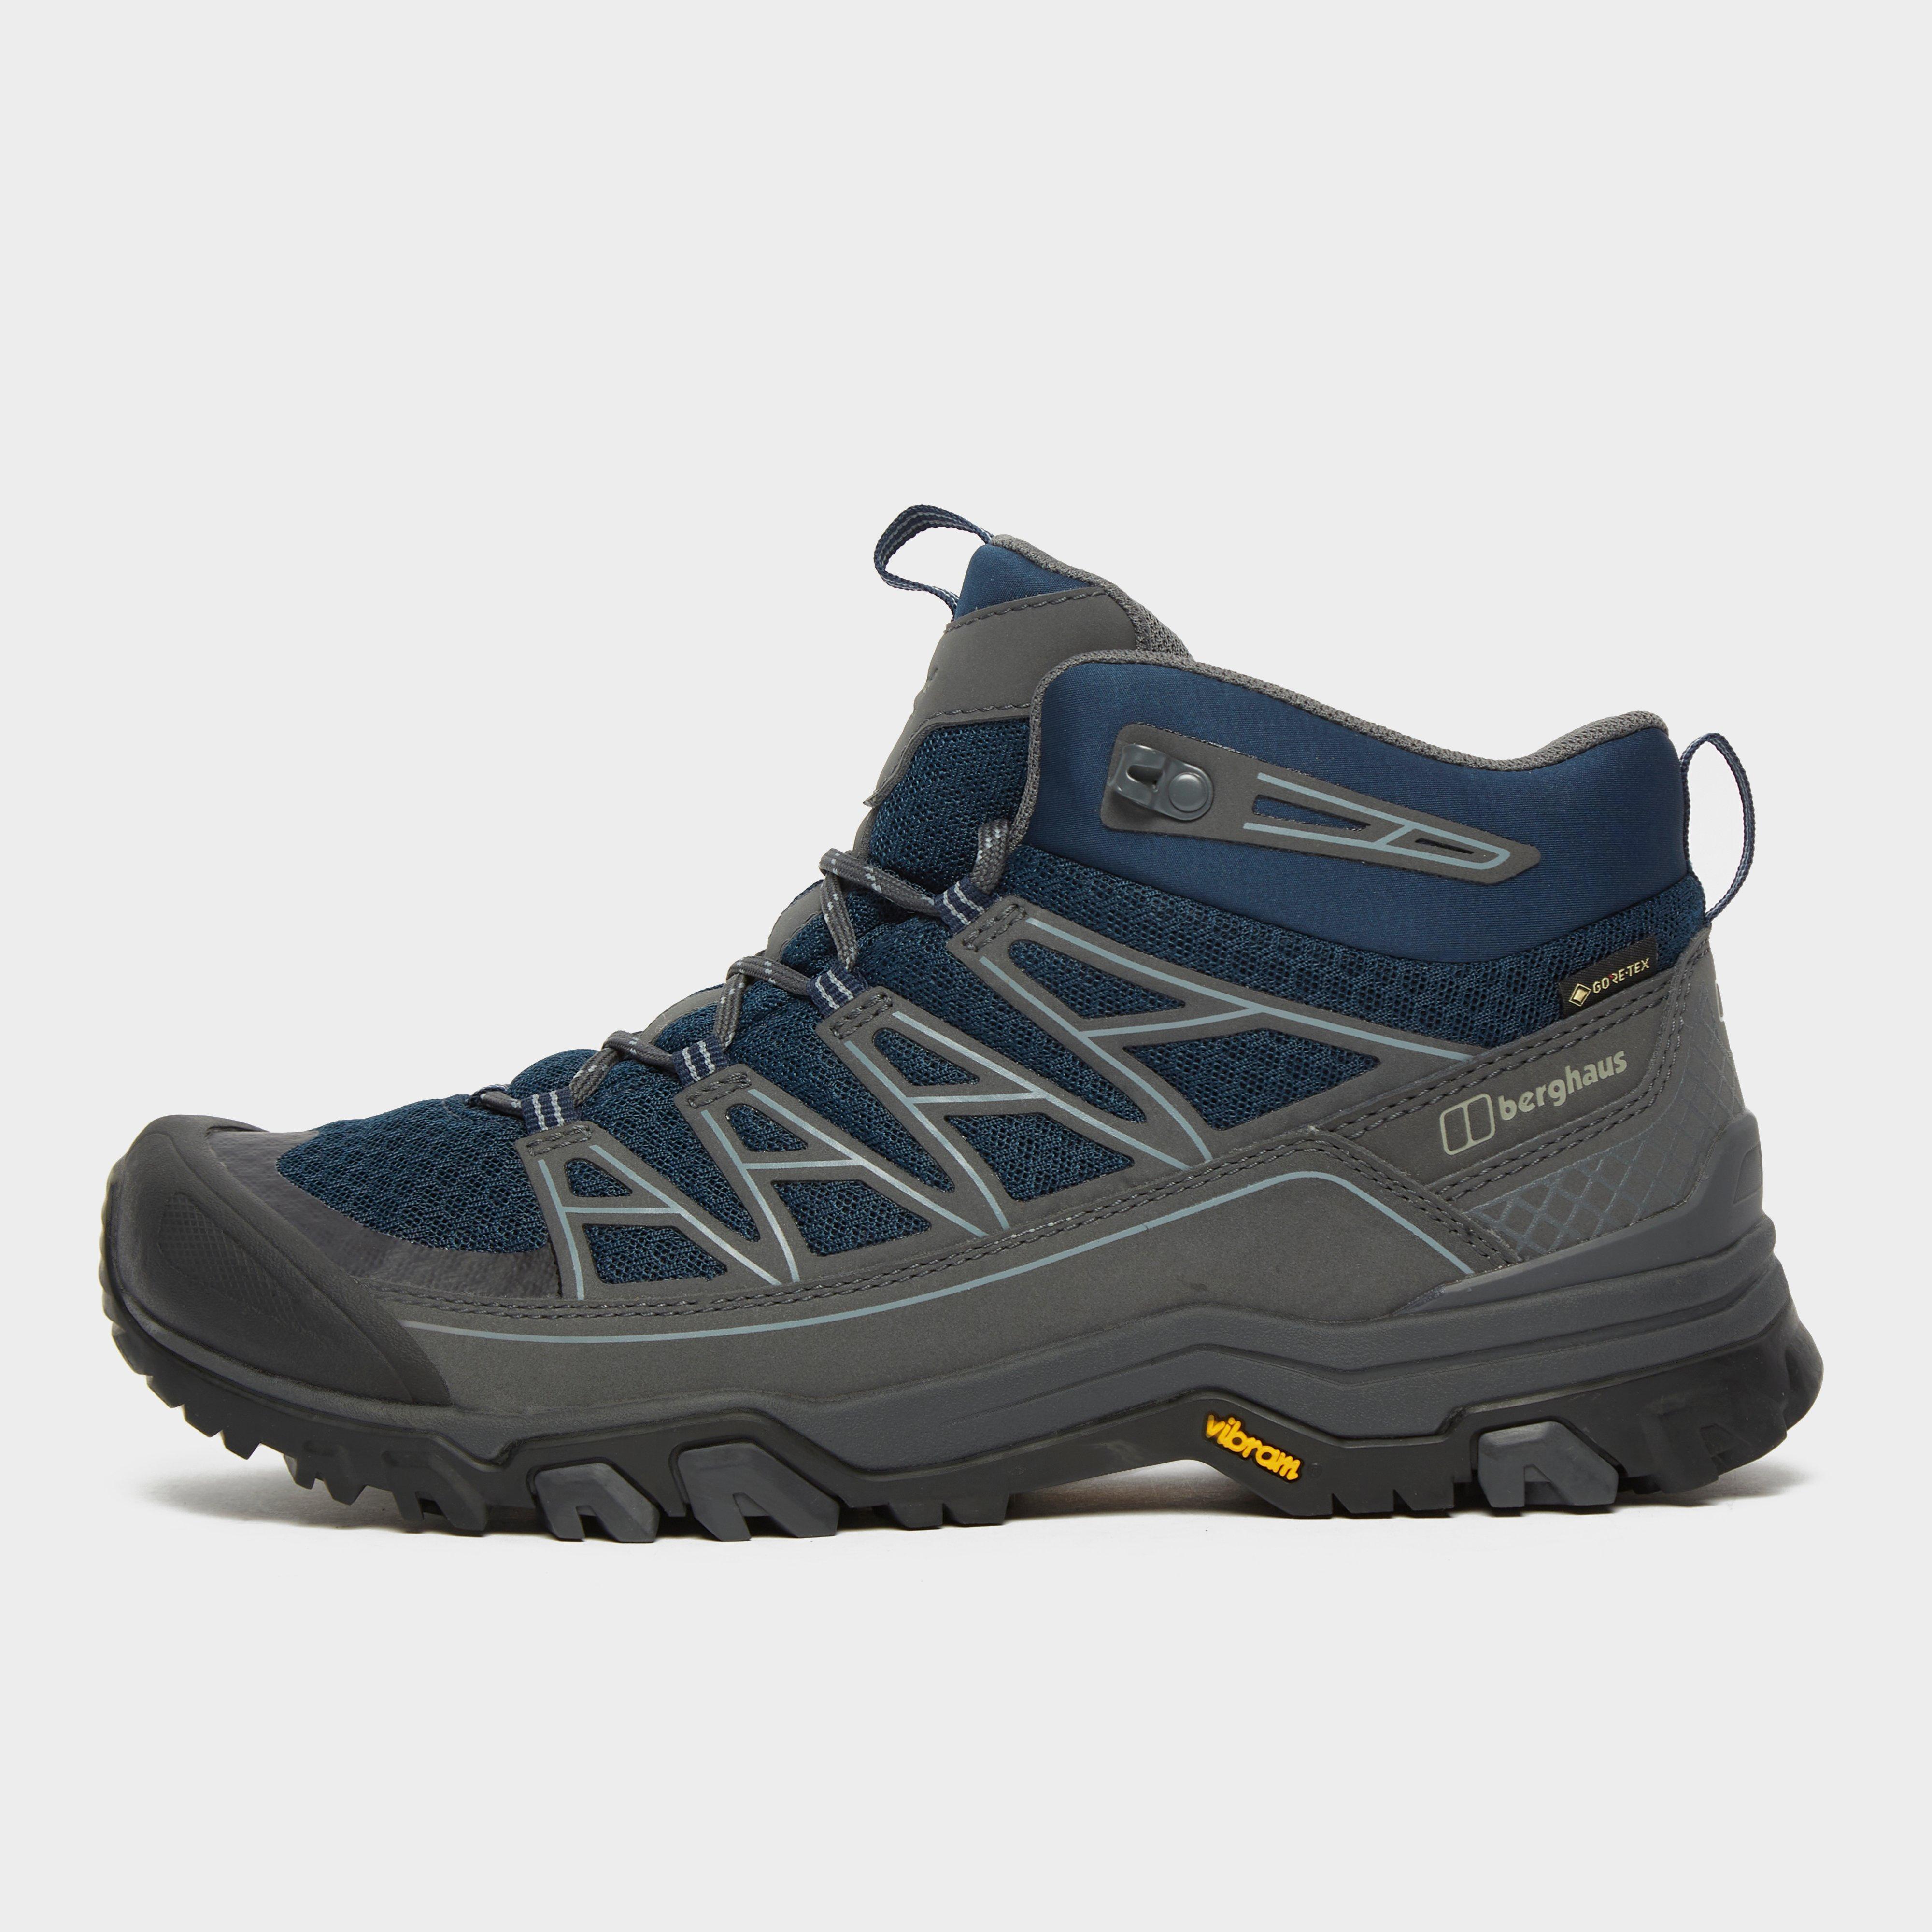 Berghaus Womens Expanse Mid Gore-tex  Walking Boots - Navy/dbl  Navy/dbl